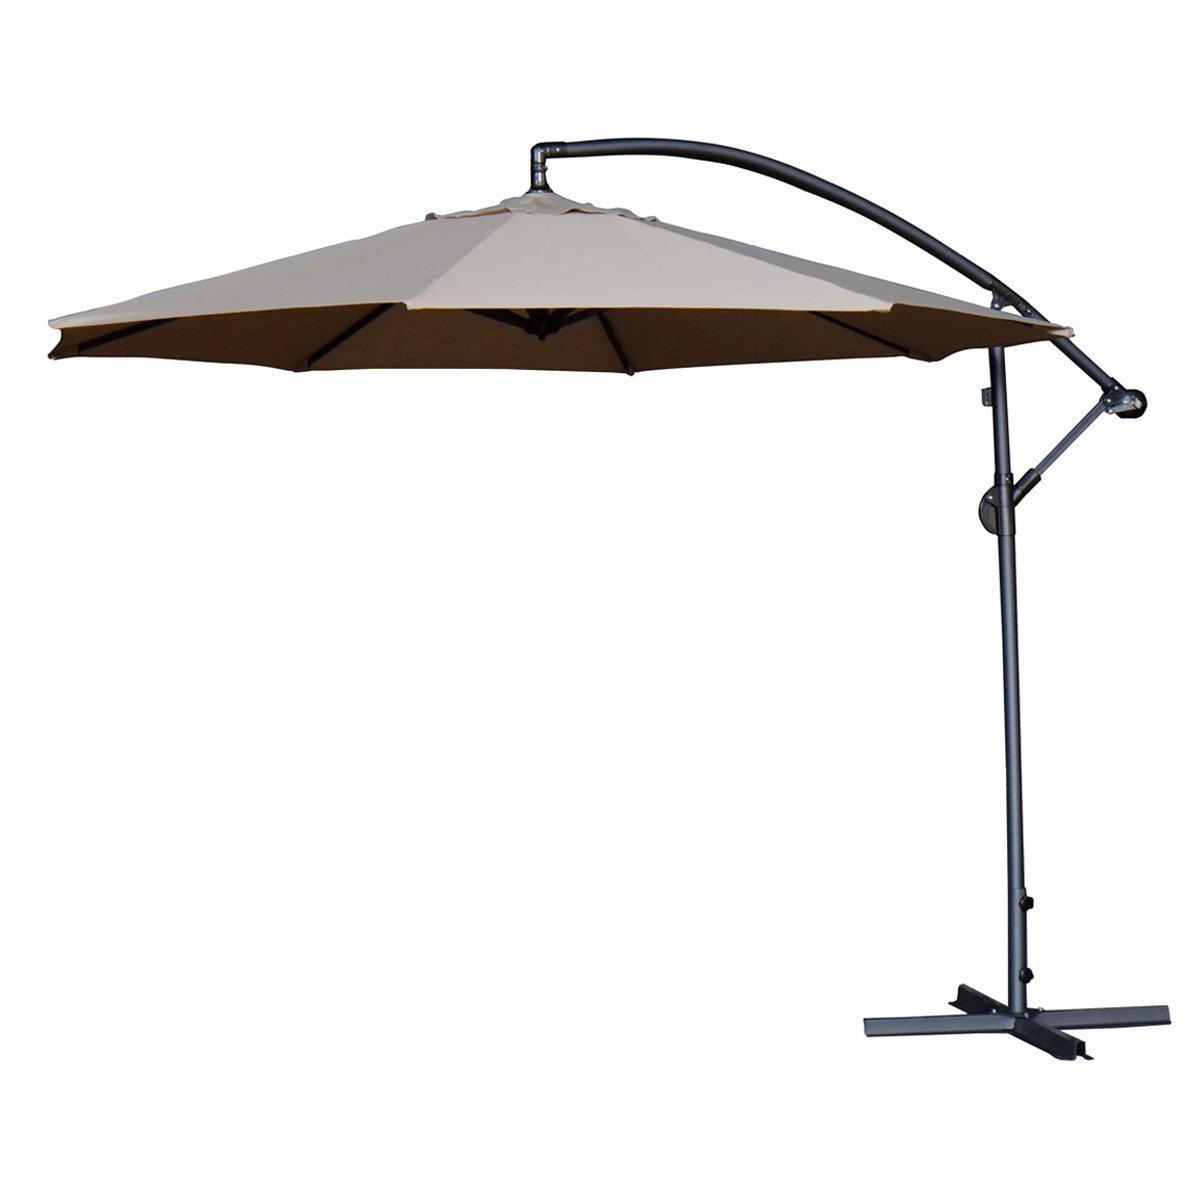 Irven 10' Cantilever Umbrella In Most Current Freda Cantilever Umbrellas (View 14 of 20)